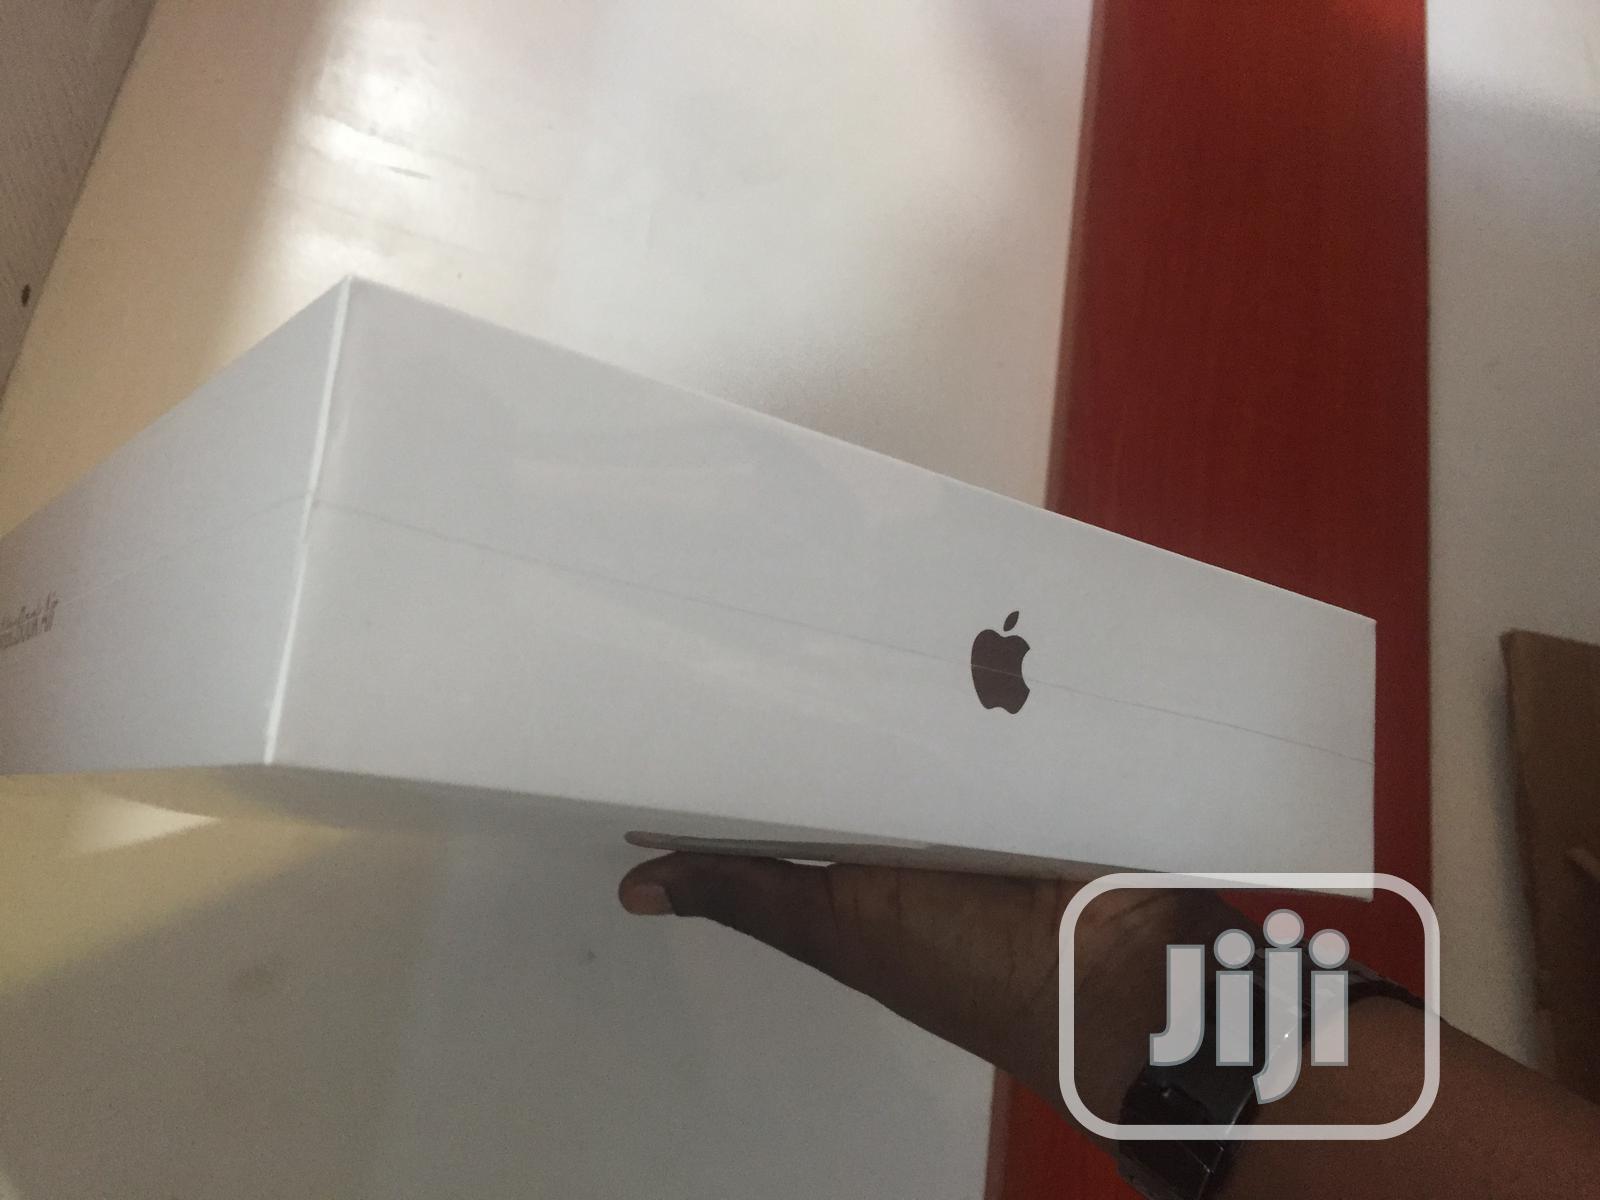 New Laptop Apple MacBook Air 8GB Intel SSD 512GB | Laptops & Computers for sale in Ikeja, Lagos State, Nigeria